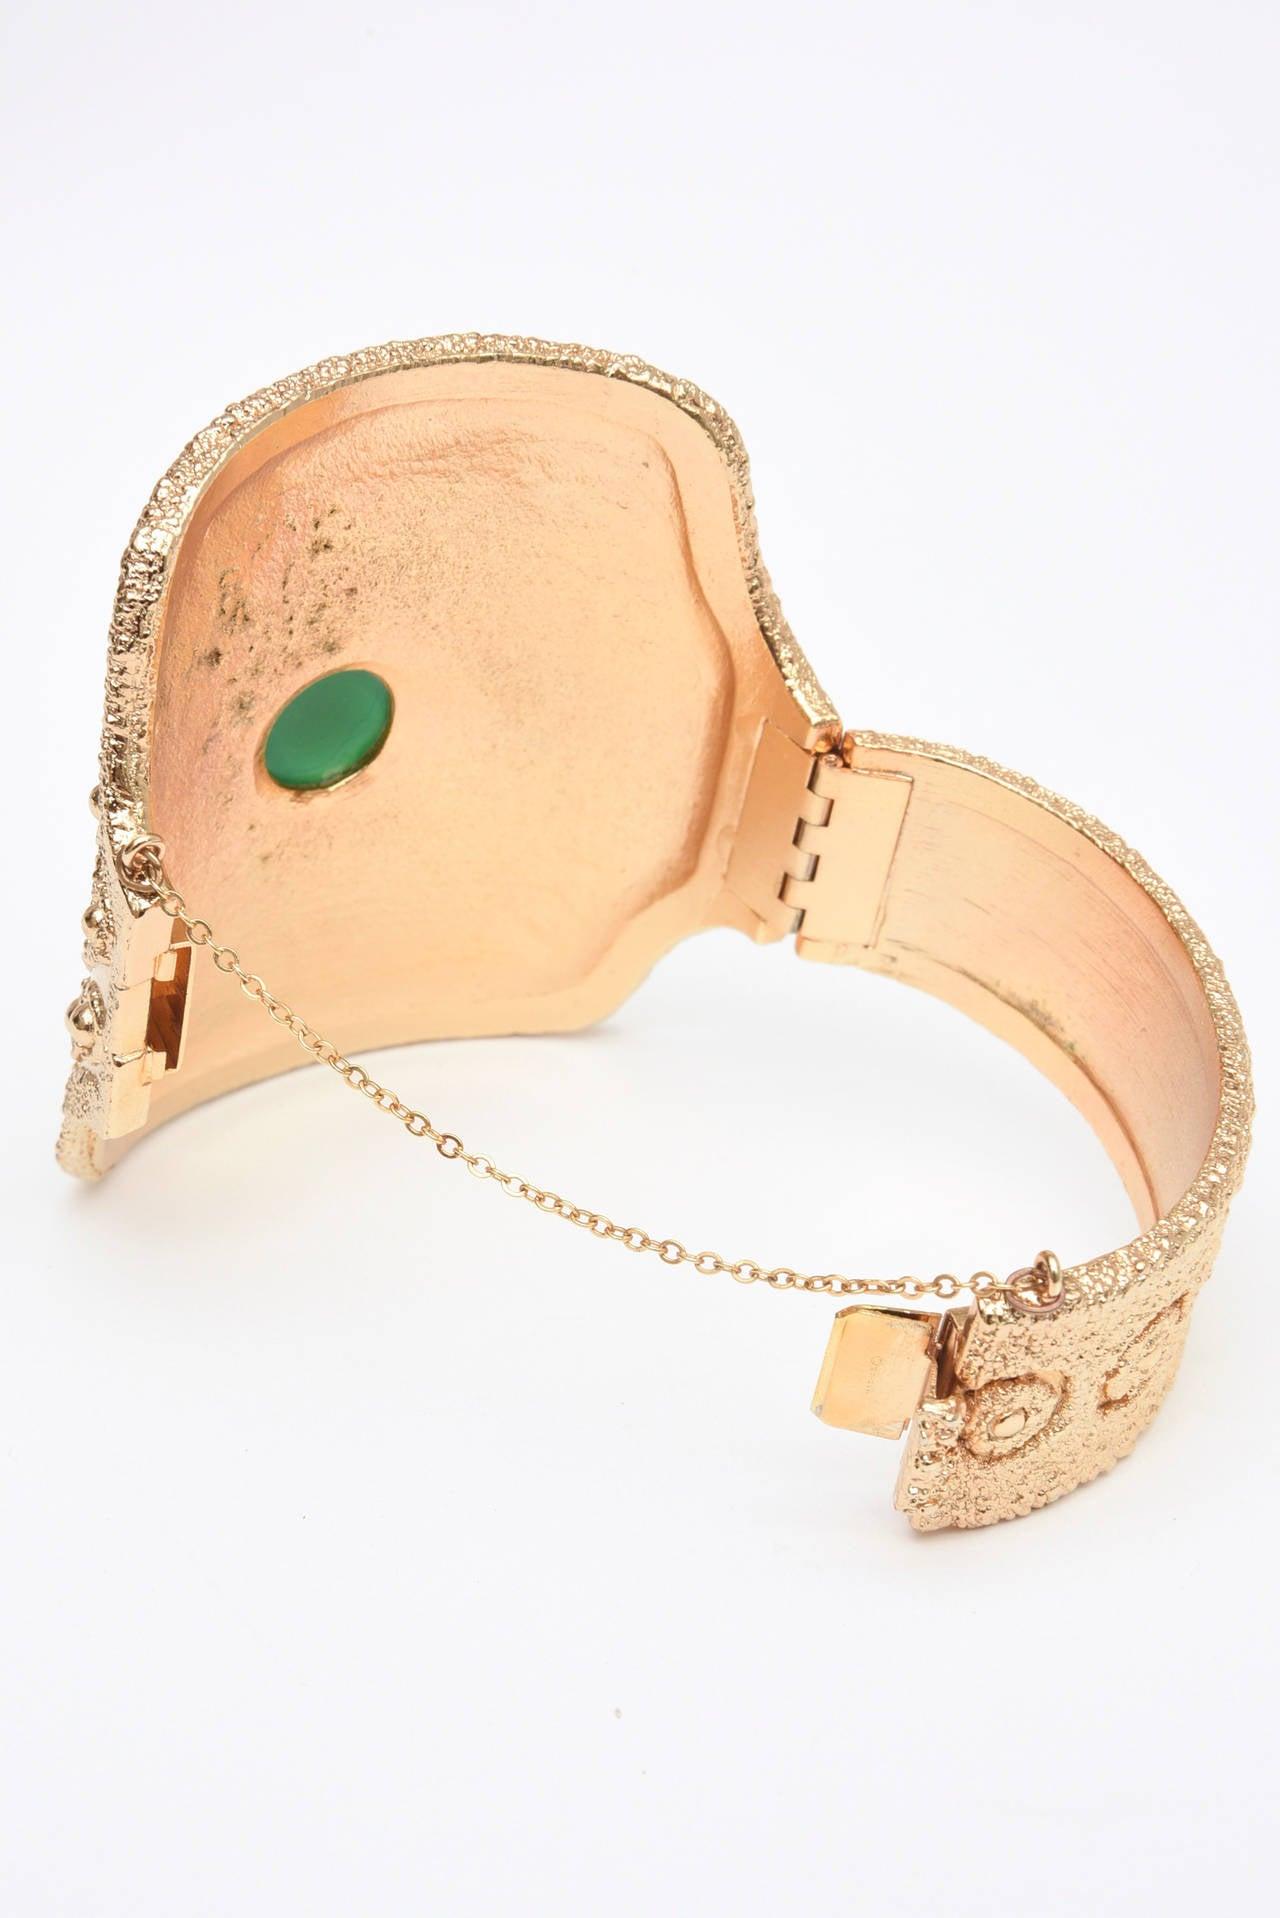 Vintage Napier Textural Gold Plated Green Glass Cuff Bracelet 6